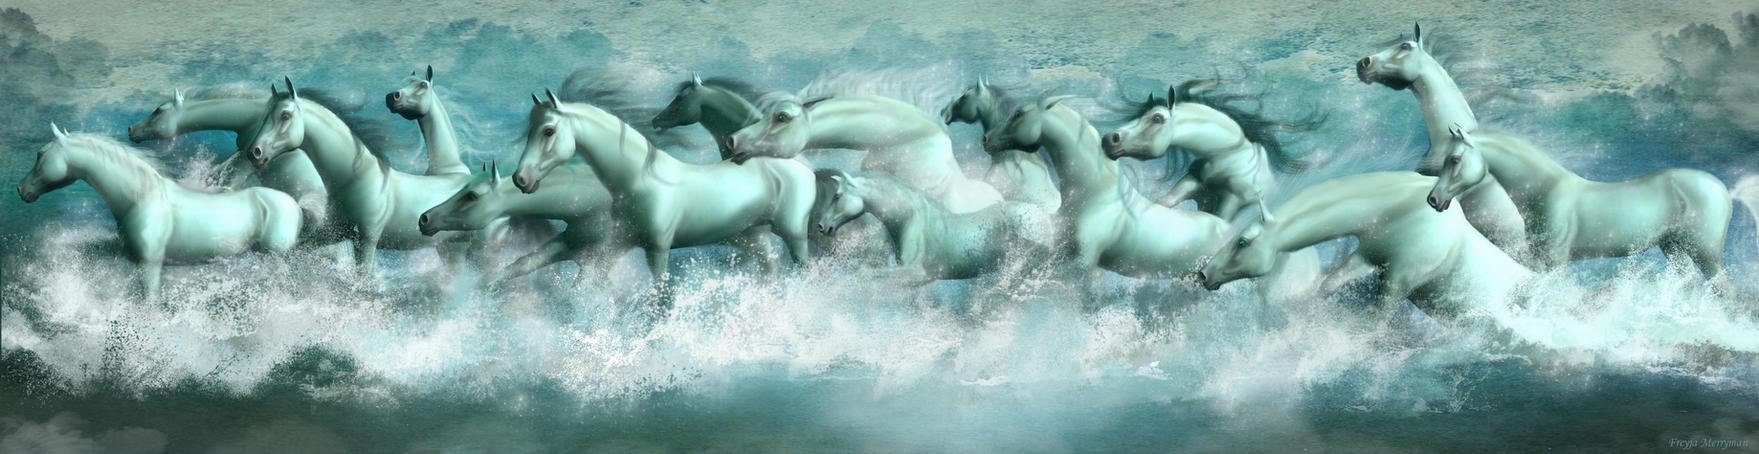 Seahorses by Freyja-M